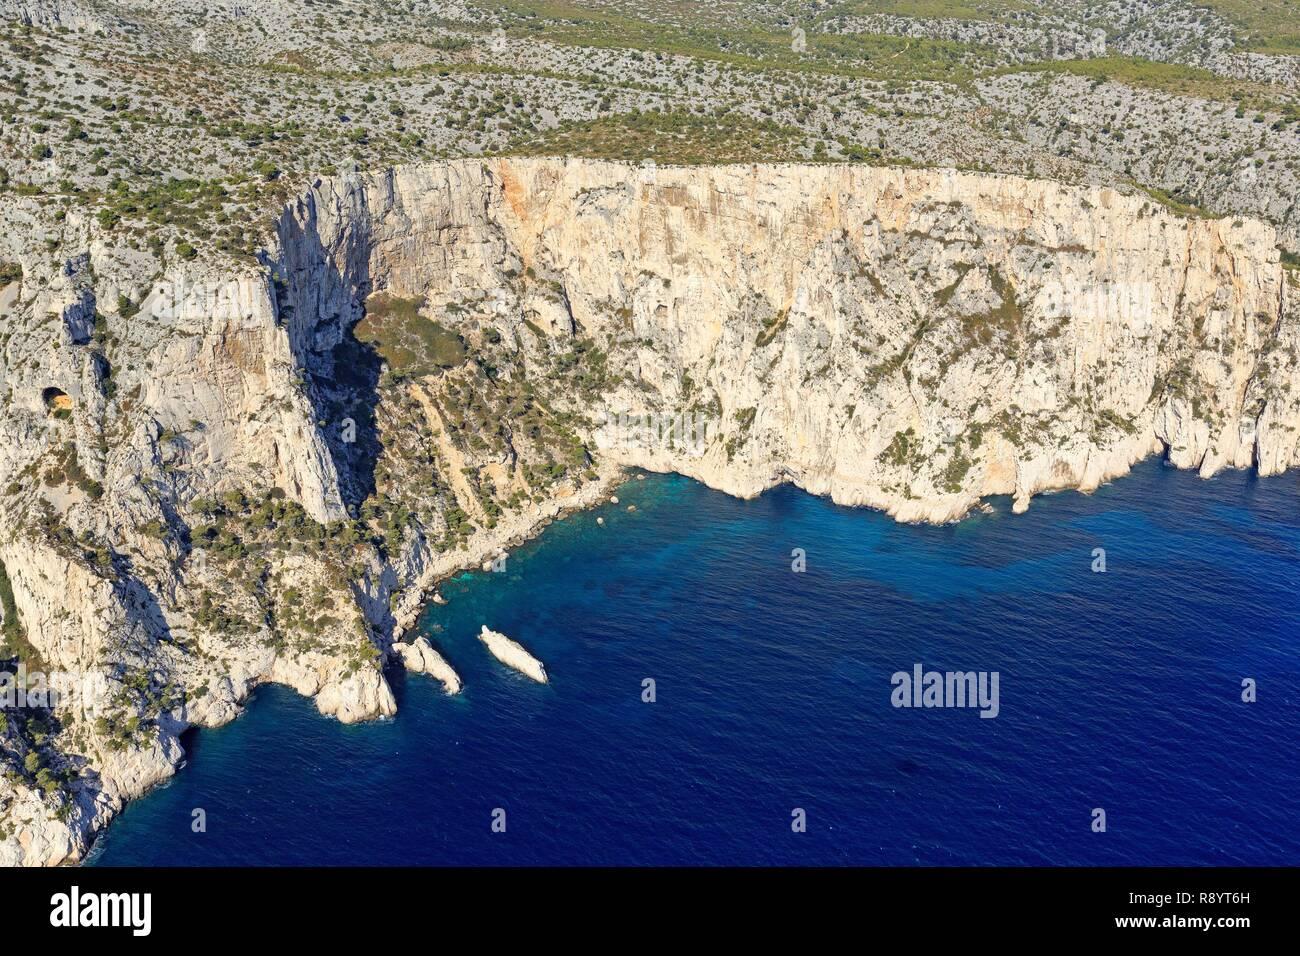 France, Bouches du Rhone, Calanques National Park, Marseille, 9th arrondissement, Devenson Cove, Dromedary Islet (aerial view) Stock Photo